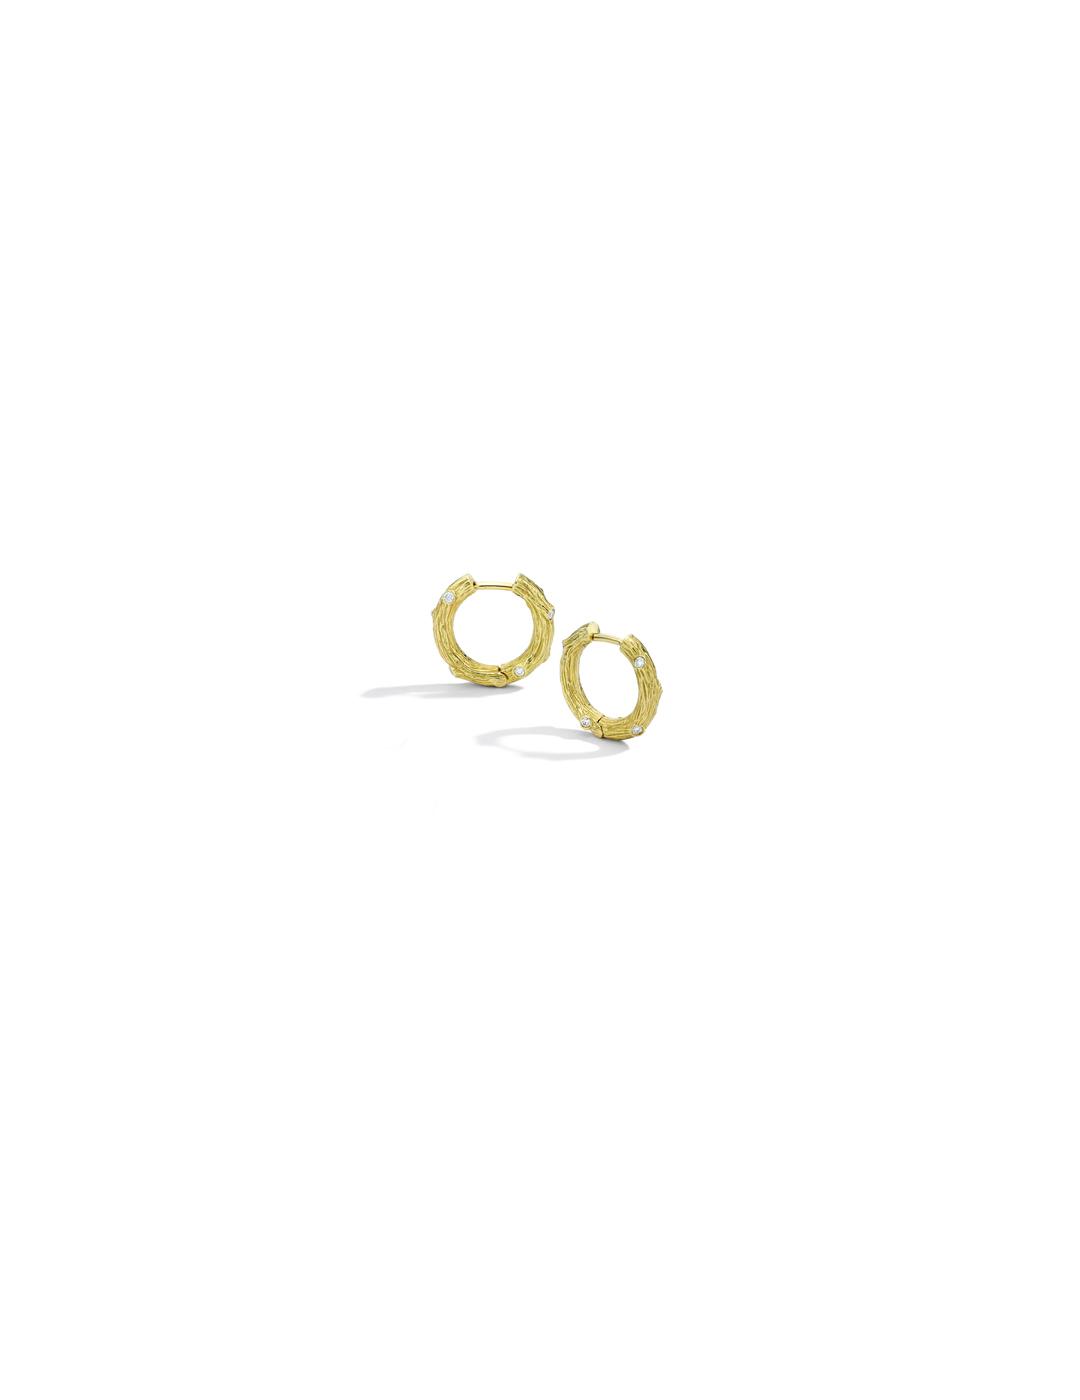 mish_products_earrings_Twig- Sml Hoop YG-ER-1